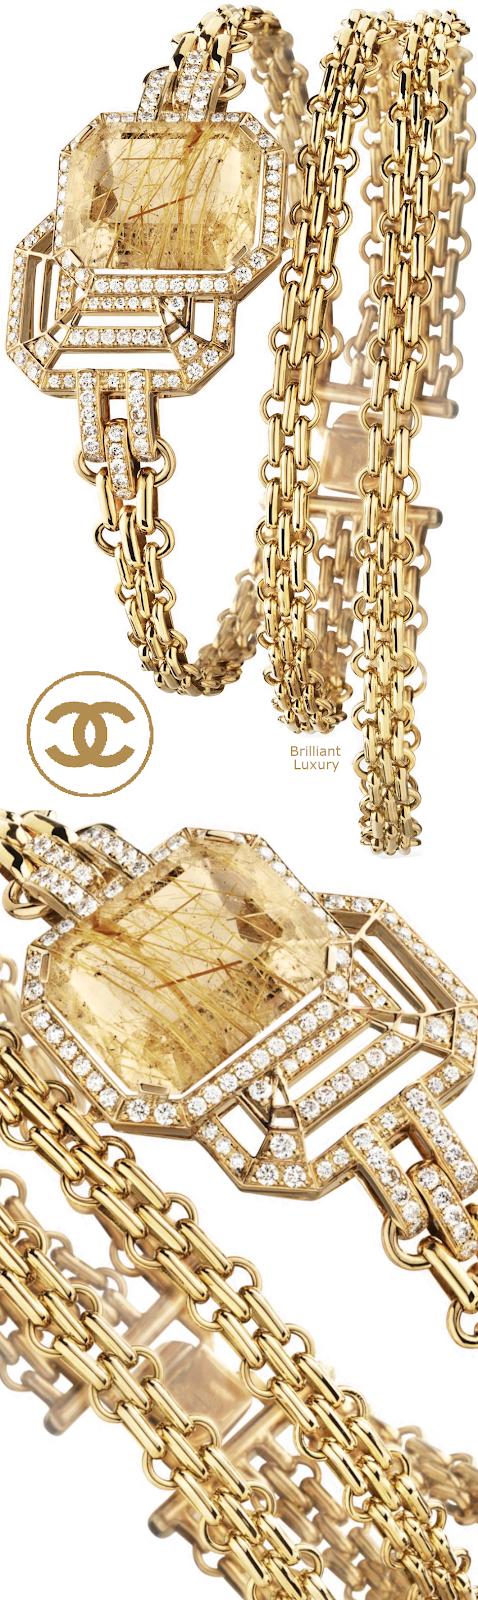 Brilliant Luxury♦Chanel My Chain bracelet